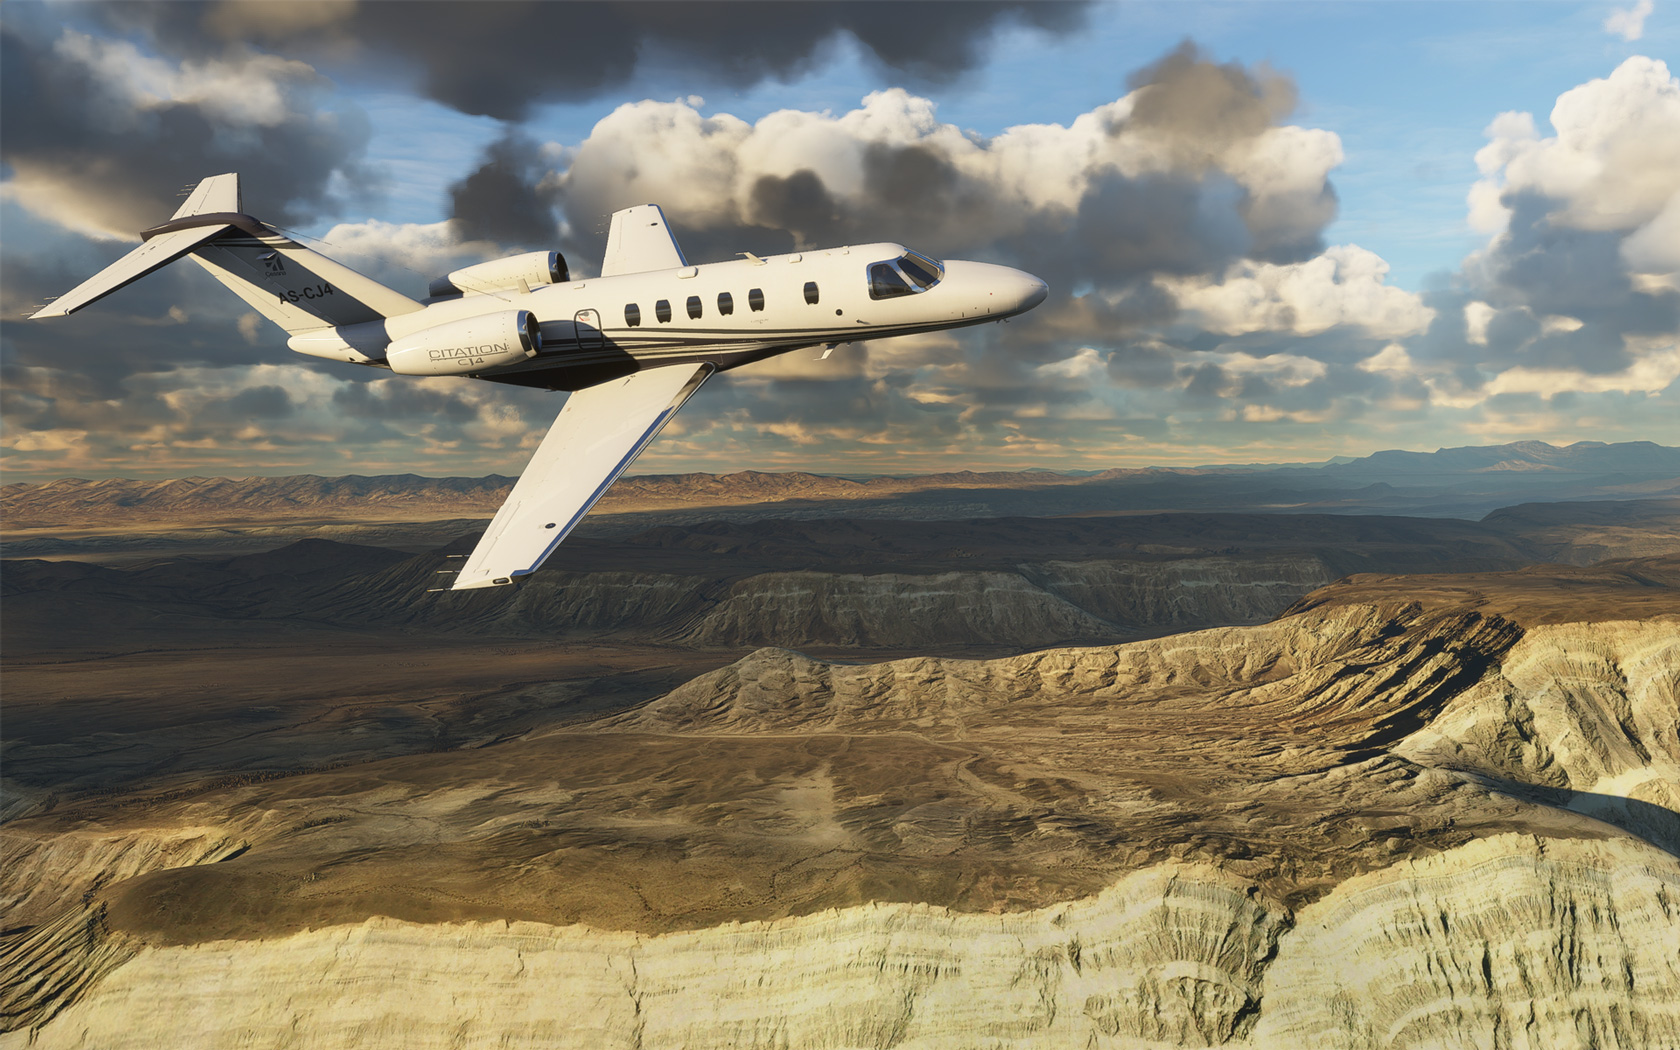 Free Microsoft Flight Simulator (2020) Wallpaper in 1680x1050